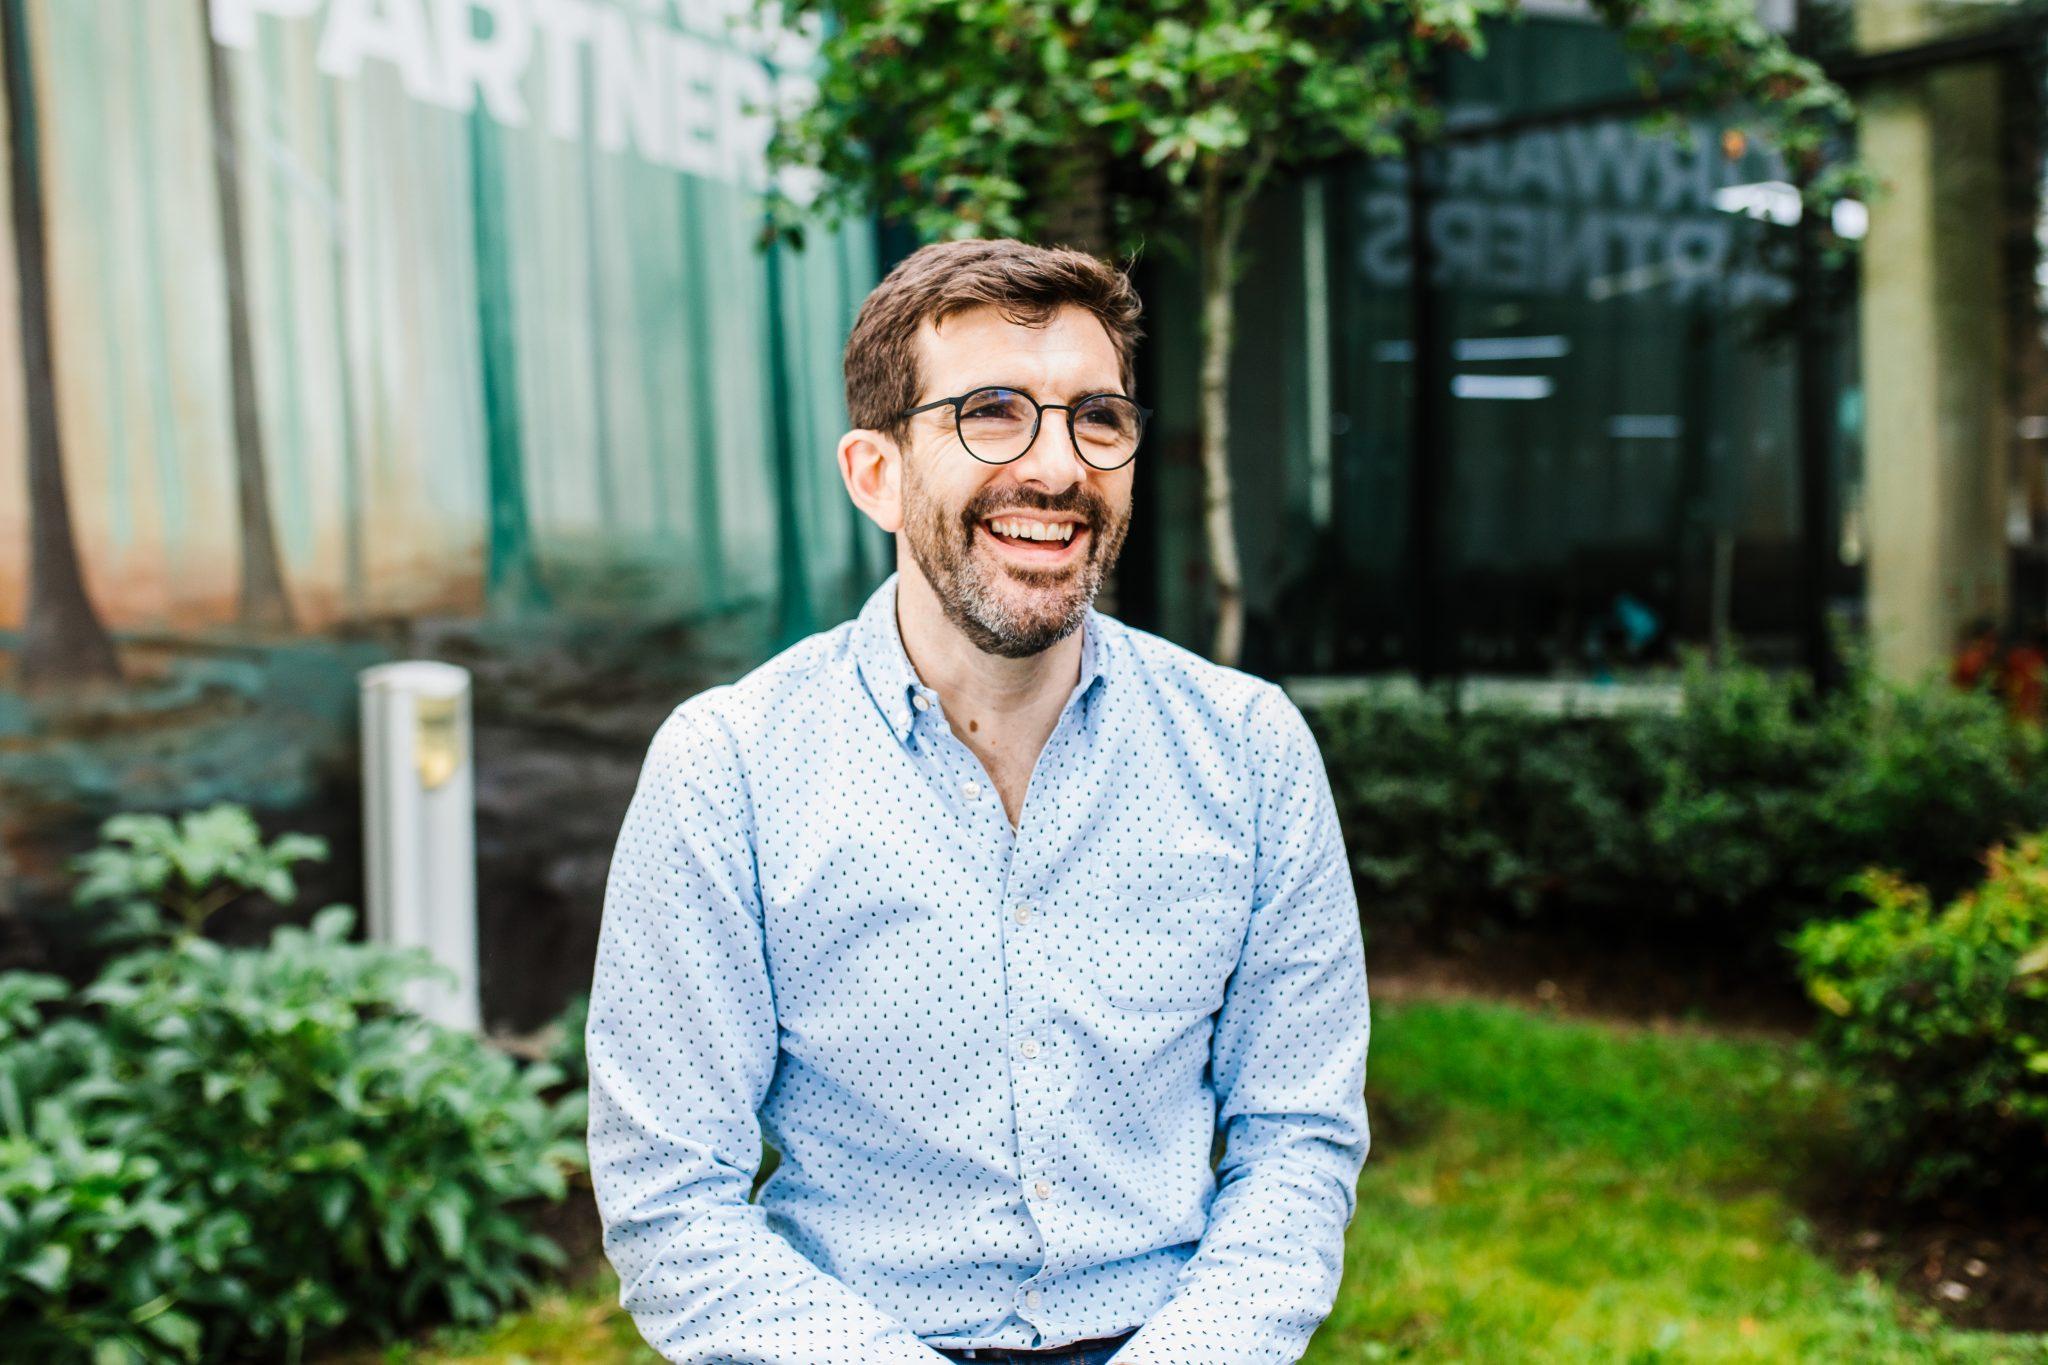 Nic Brisbourne, managing partner of Forward Partners